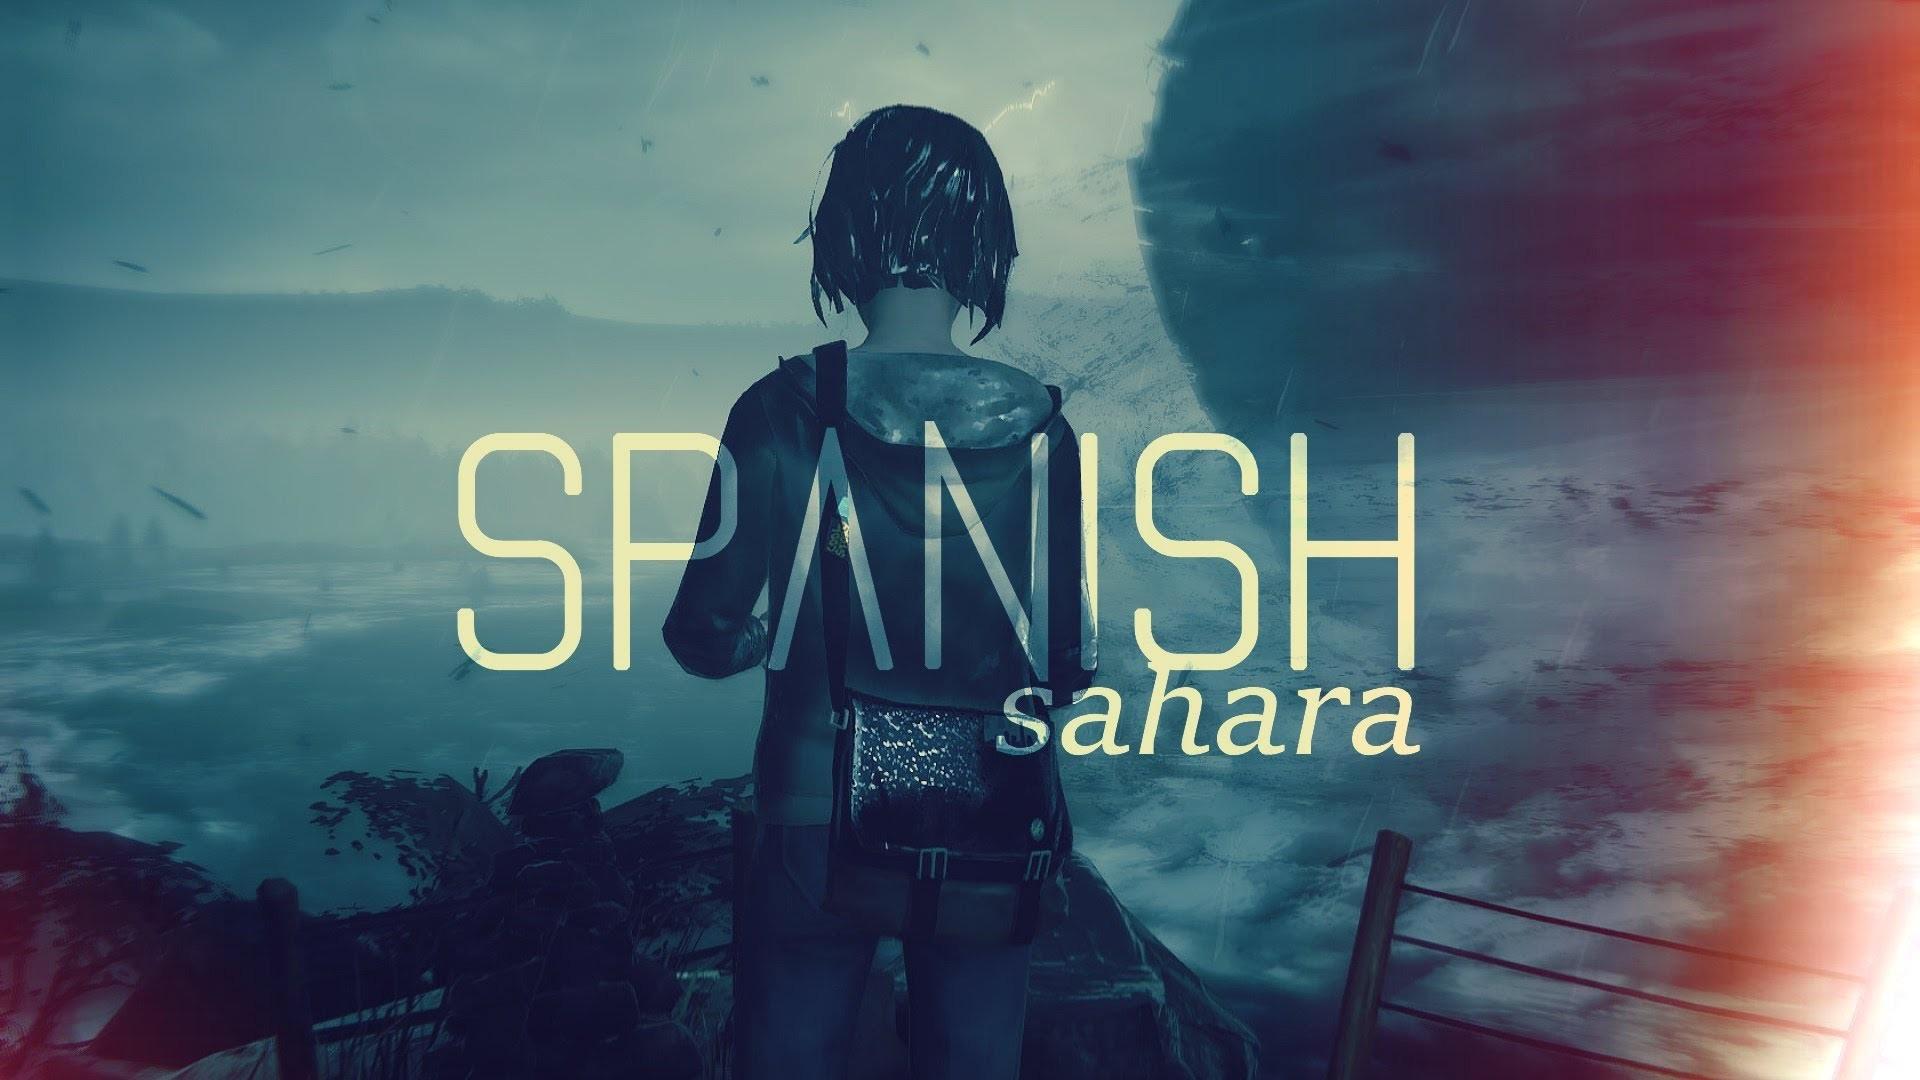 Life is Strange Tribute (Foals – Spanish Sahara) || Remix || HD Max and  Chloe Pricefield – YouTube